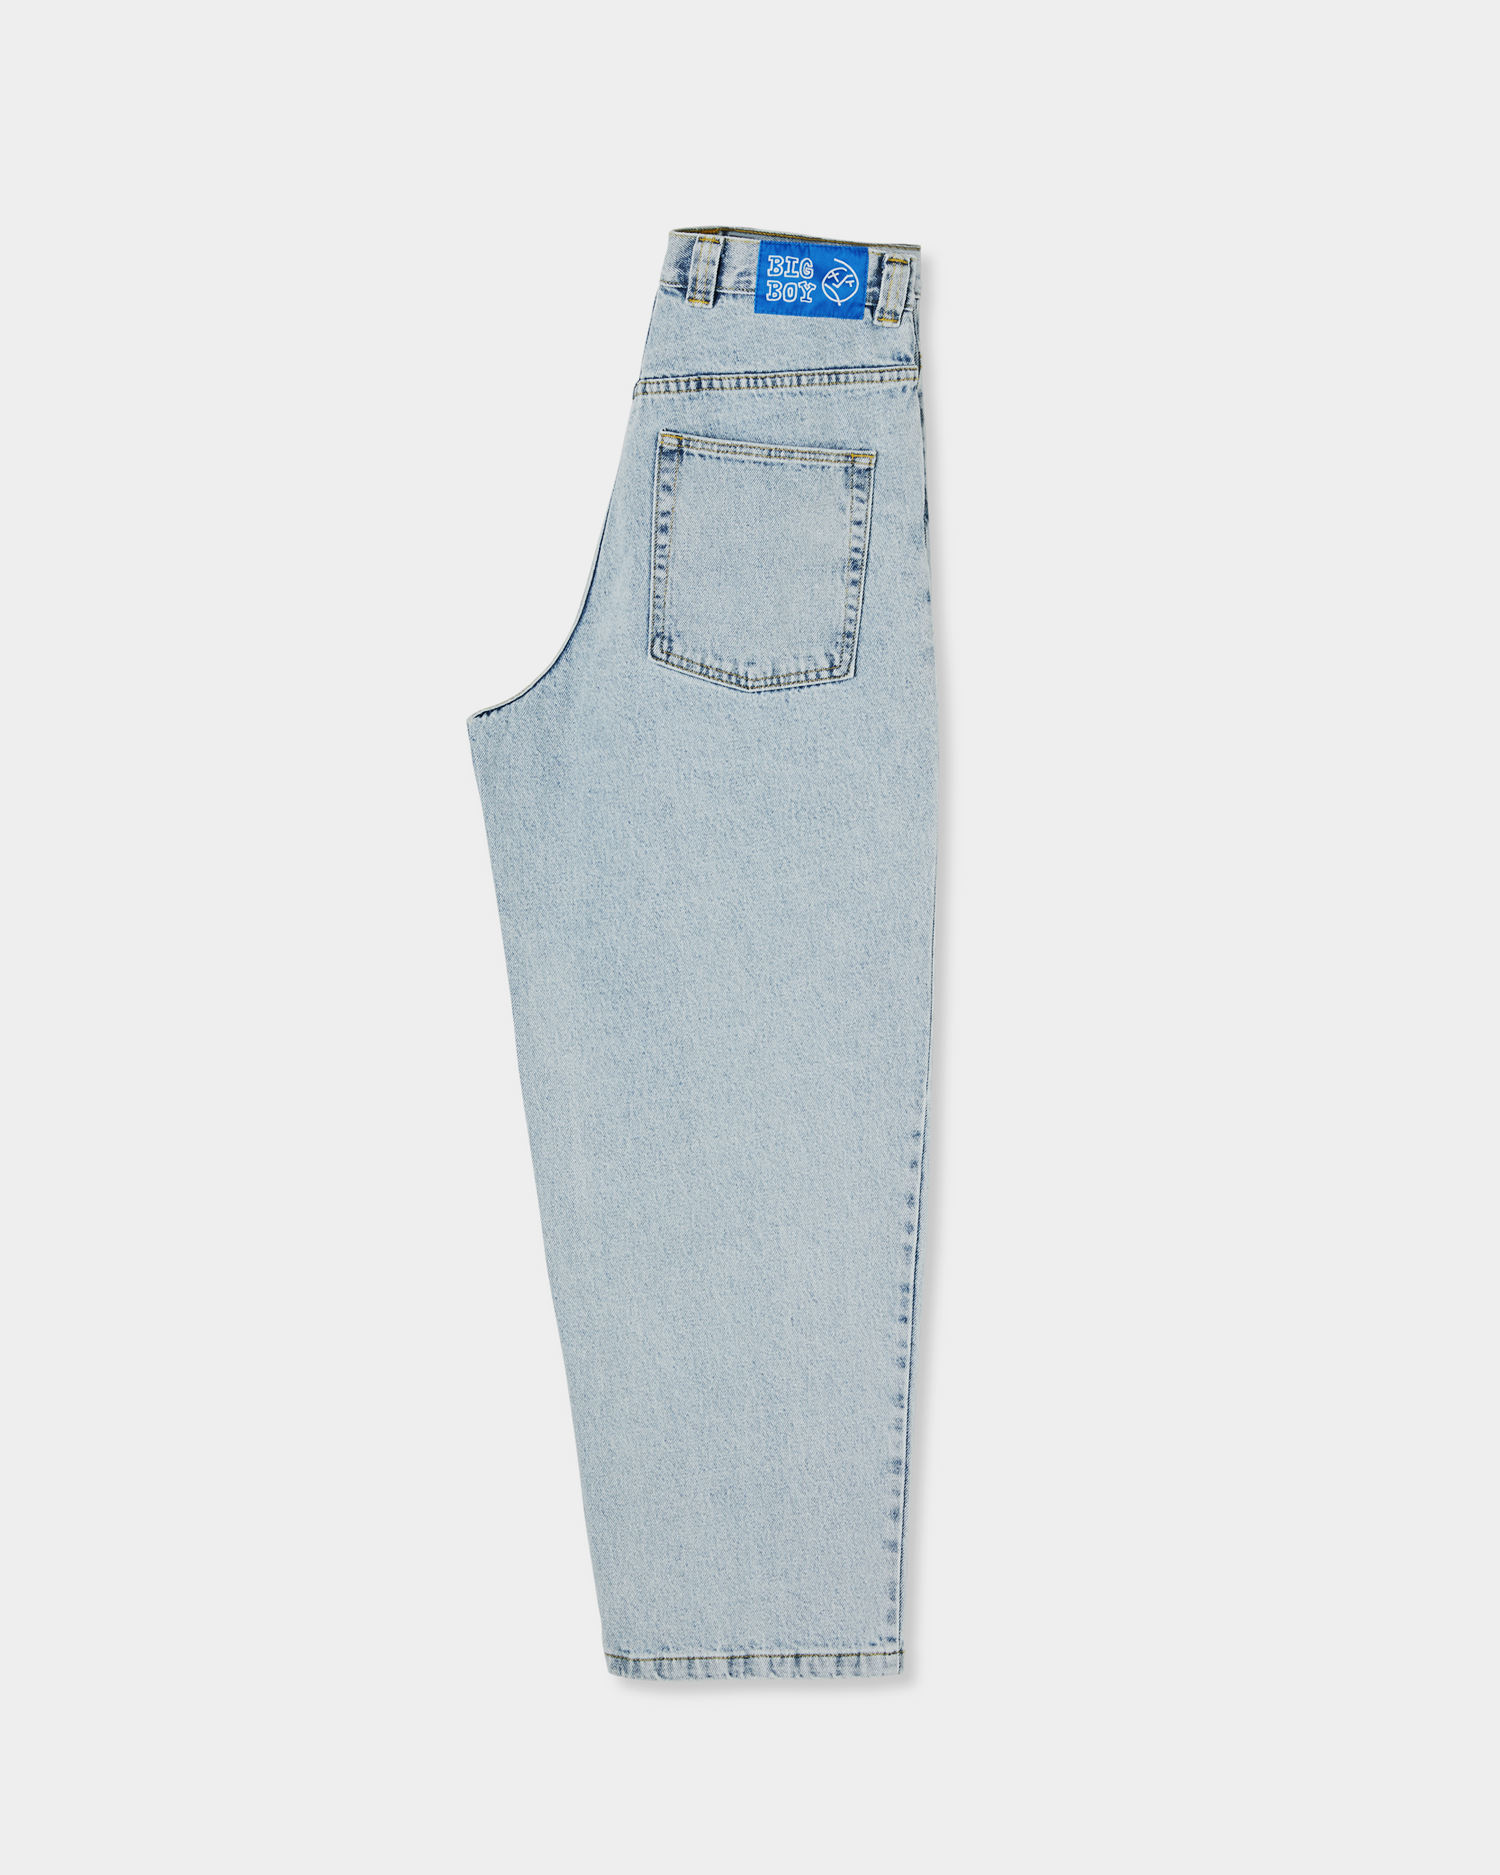 Polar Big Boy Jeans Light Blue